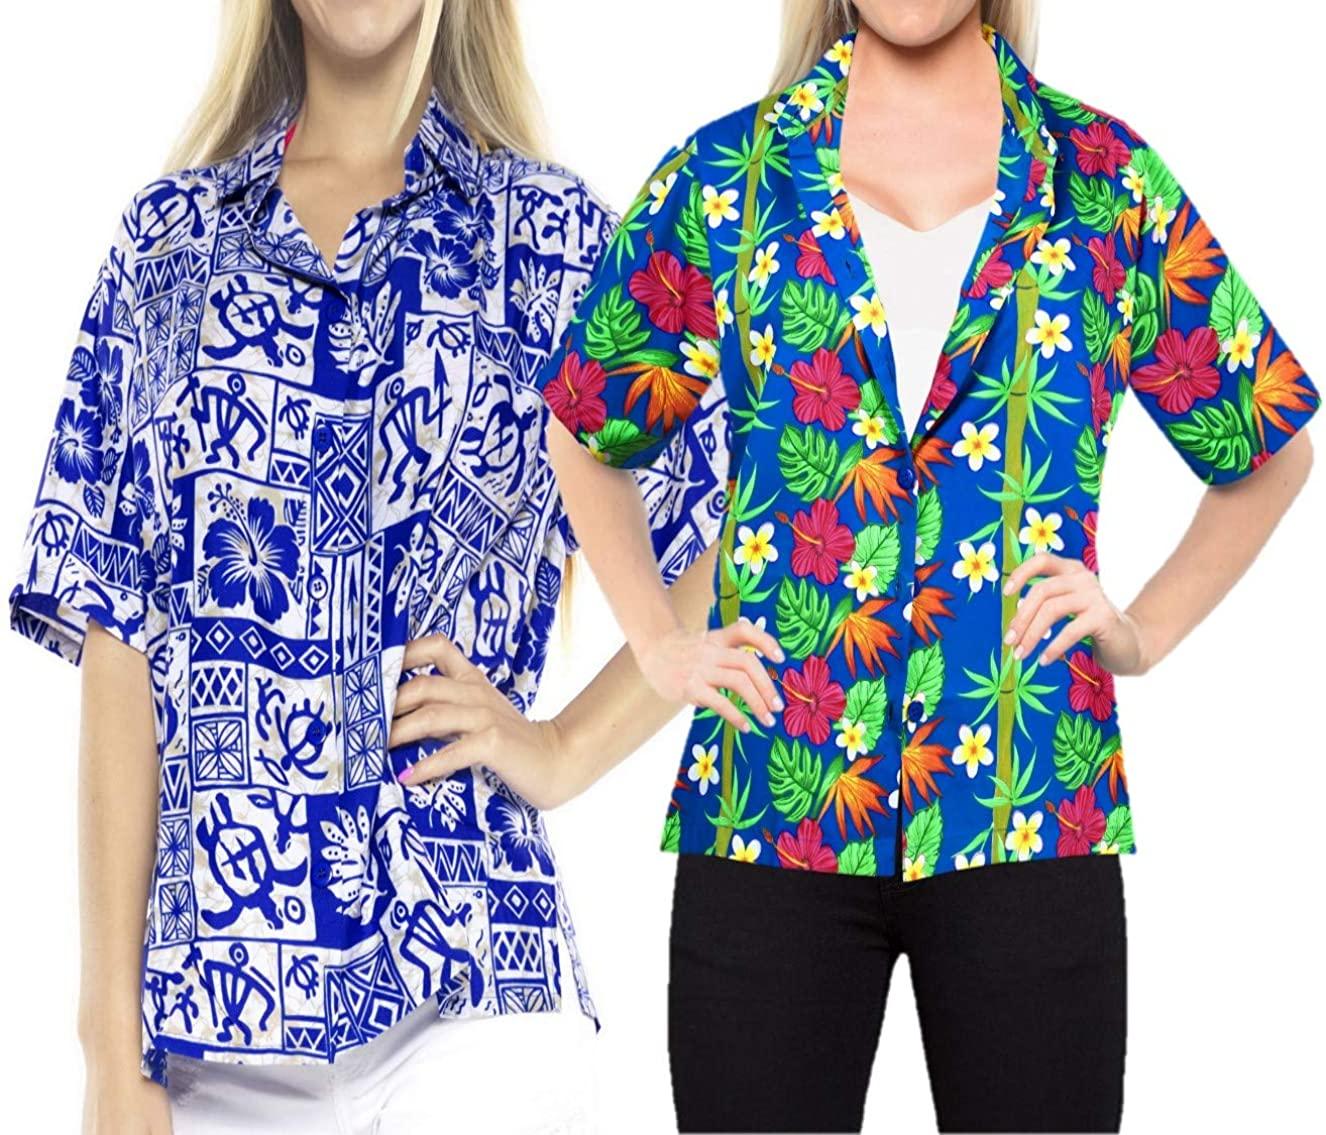 LA LEELA Women's Beach Hawaiian Shirt Button Down Aloha Camp Shirt Work from Home Clothes Women Beach Shirt Blouse Shirt Combo Pack of 2 Size XXL